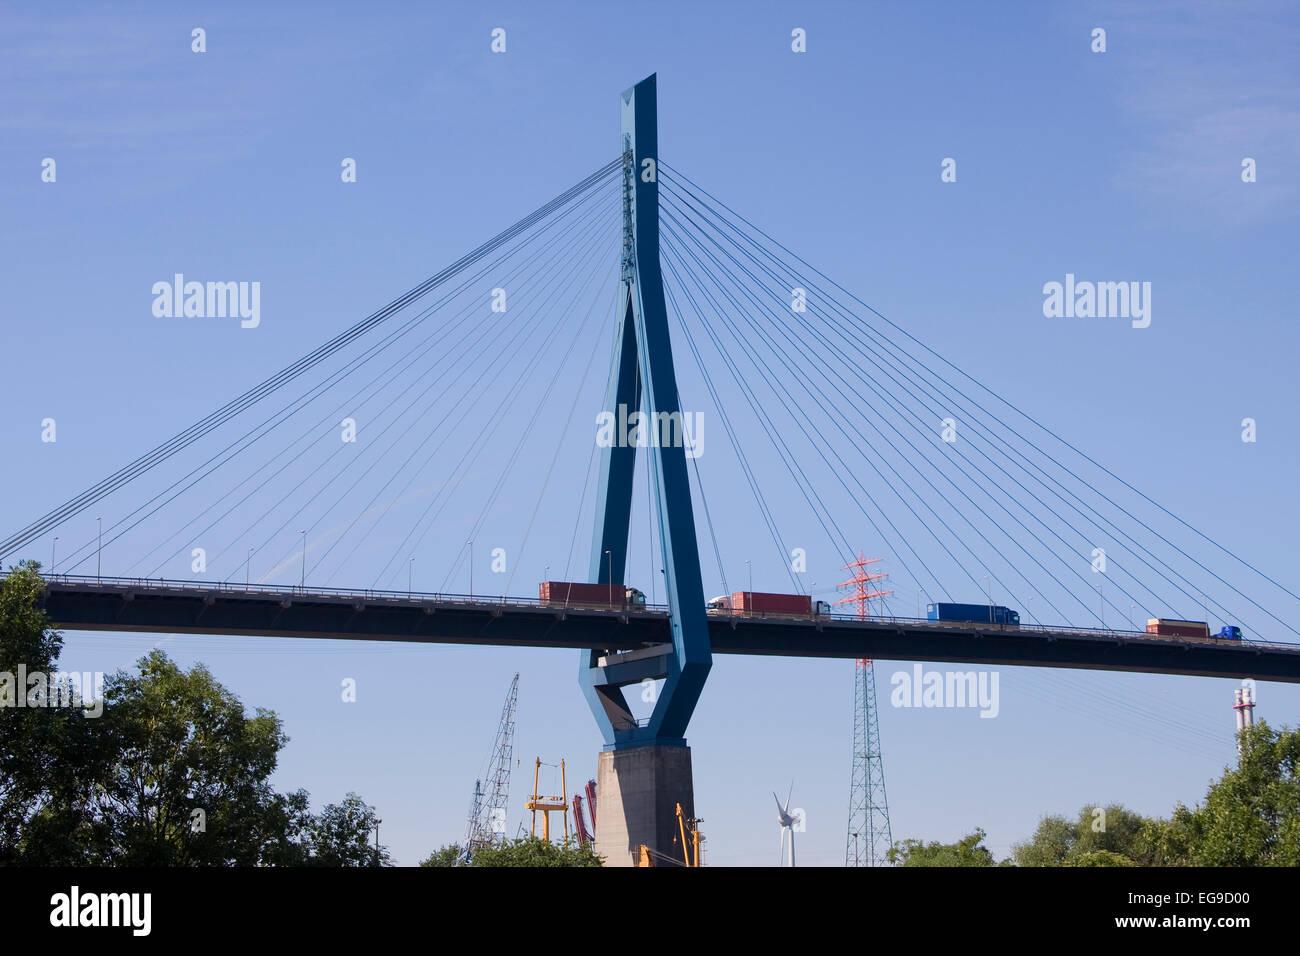 Köhlbrand bridge, Hamburg, Germany, Europe Stock Photo